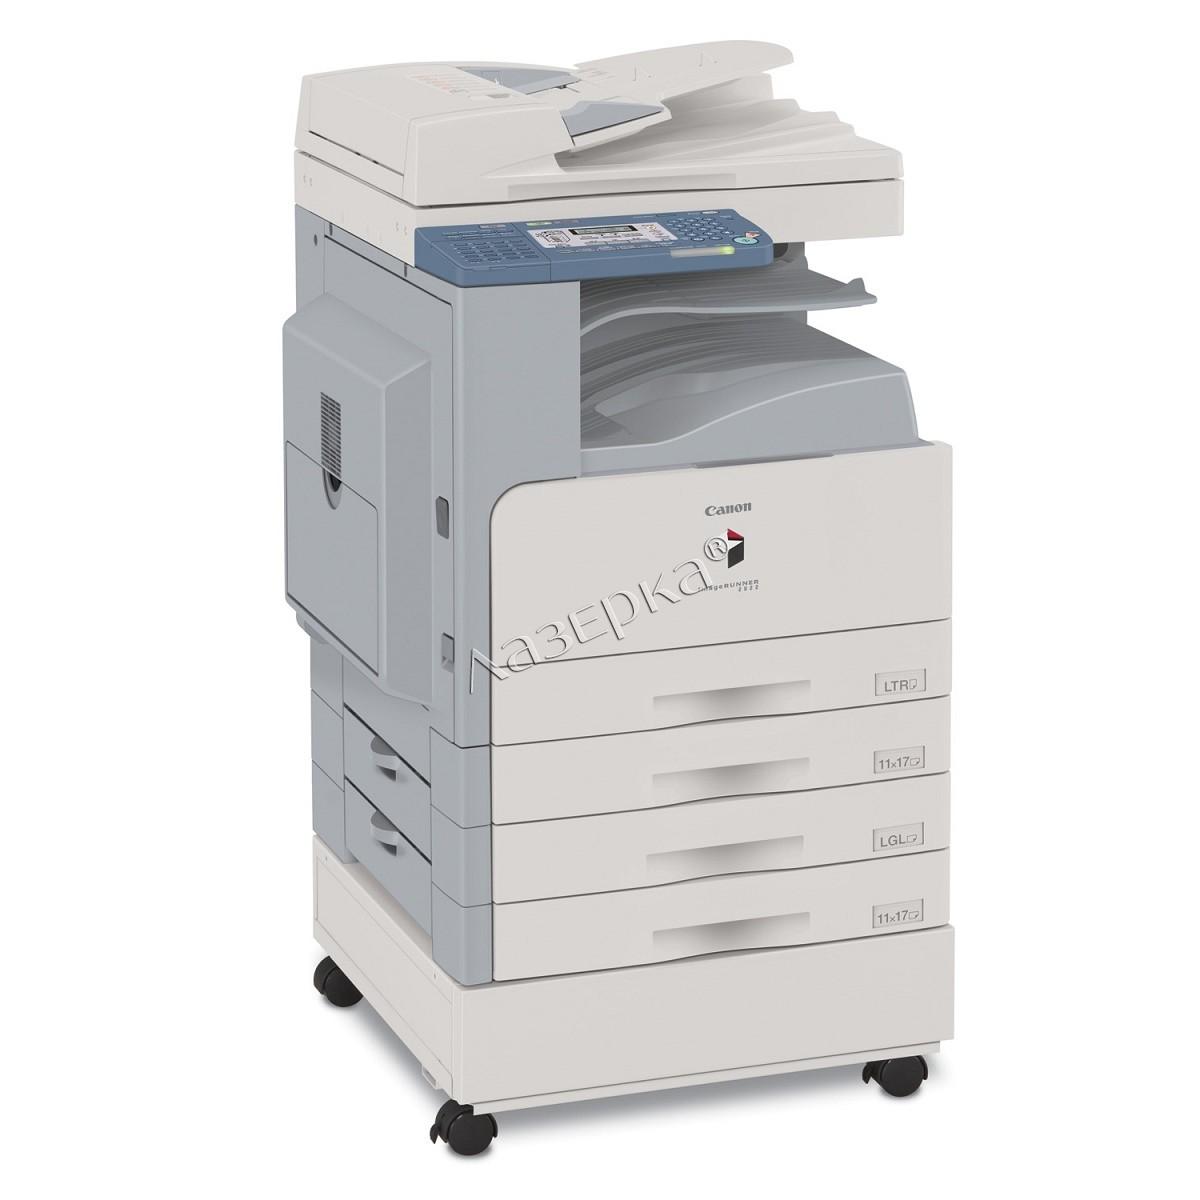 CANON IR1600 SERIES SERVICE MANUAL Pdf Download Canon ir1600 photocopier user manual